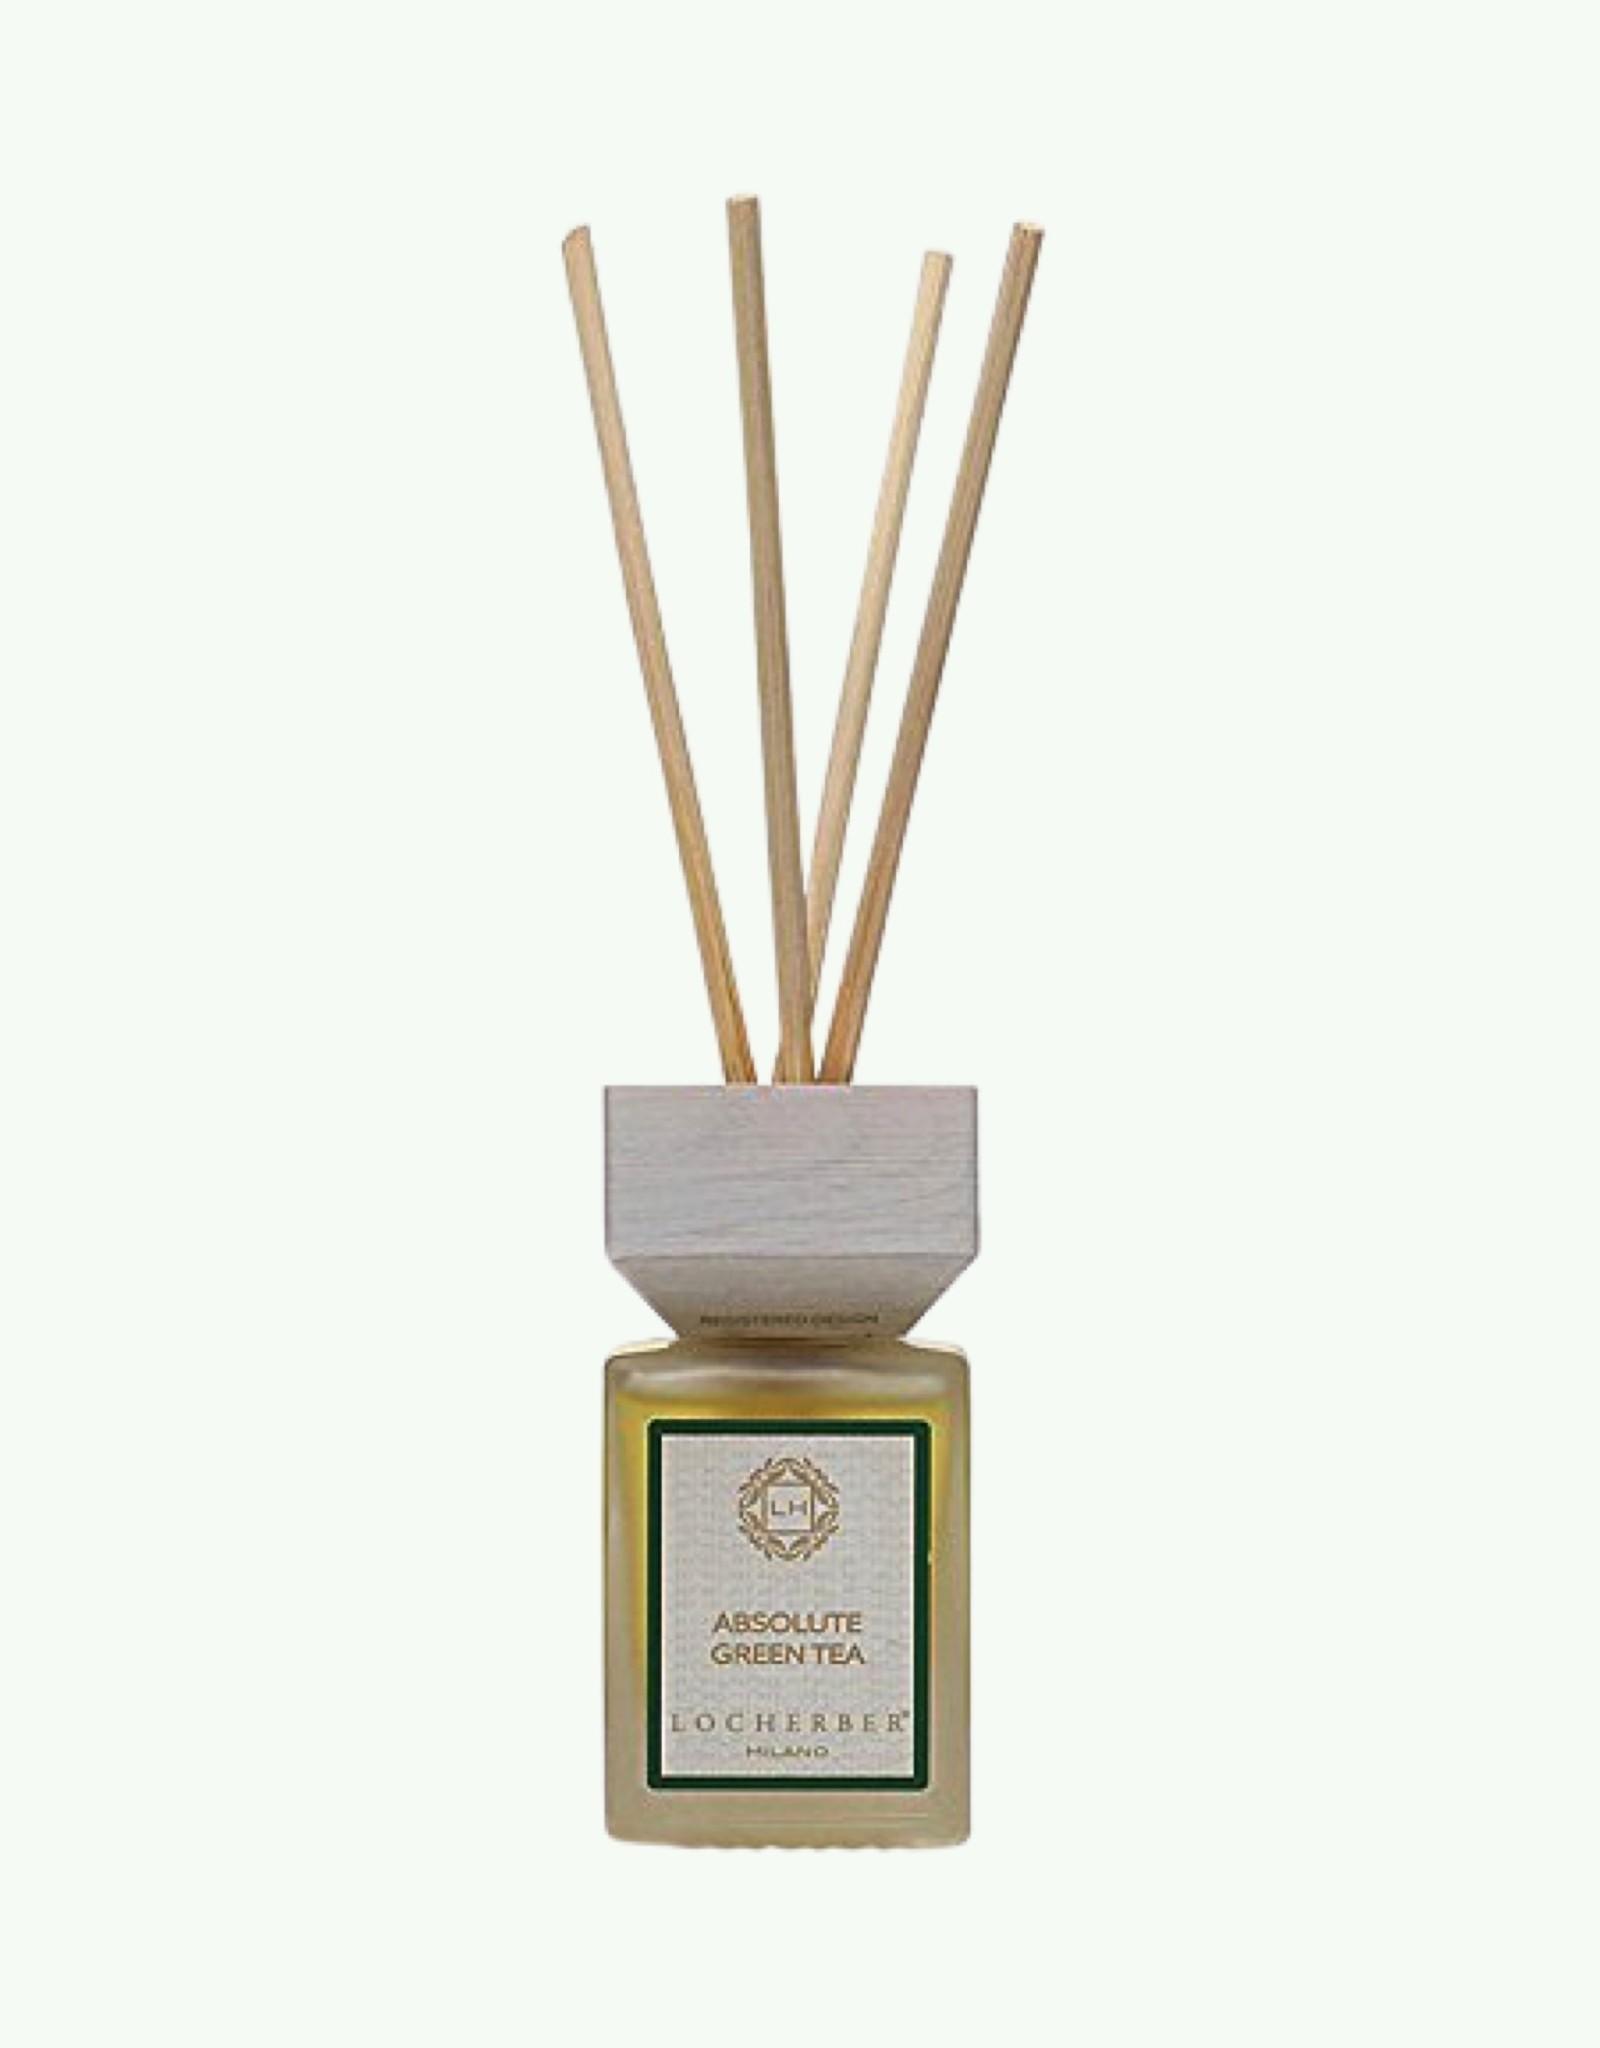 Locherber Locherber - Absolute Green Tea - Diffuser met Geurstokjes